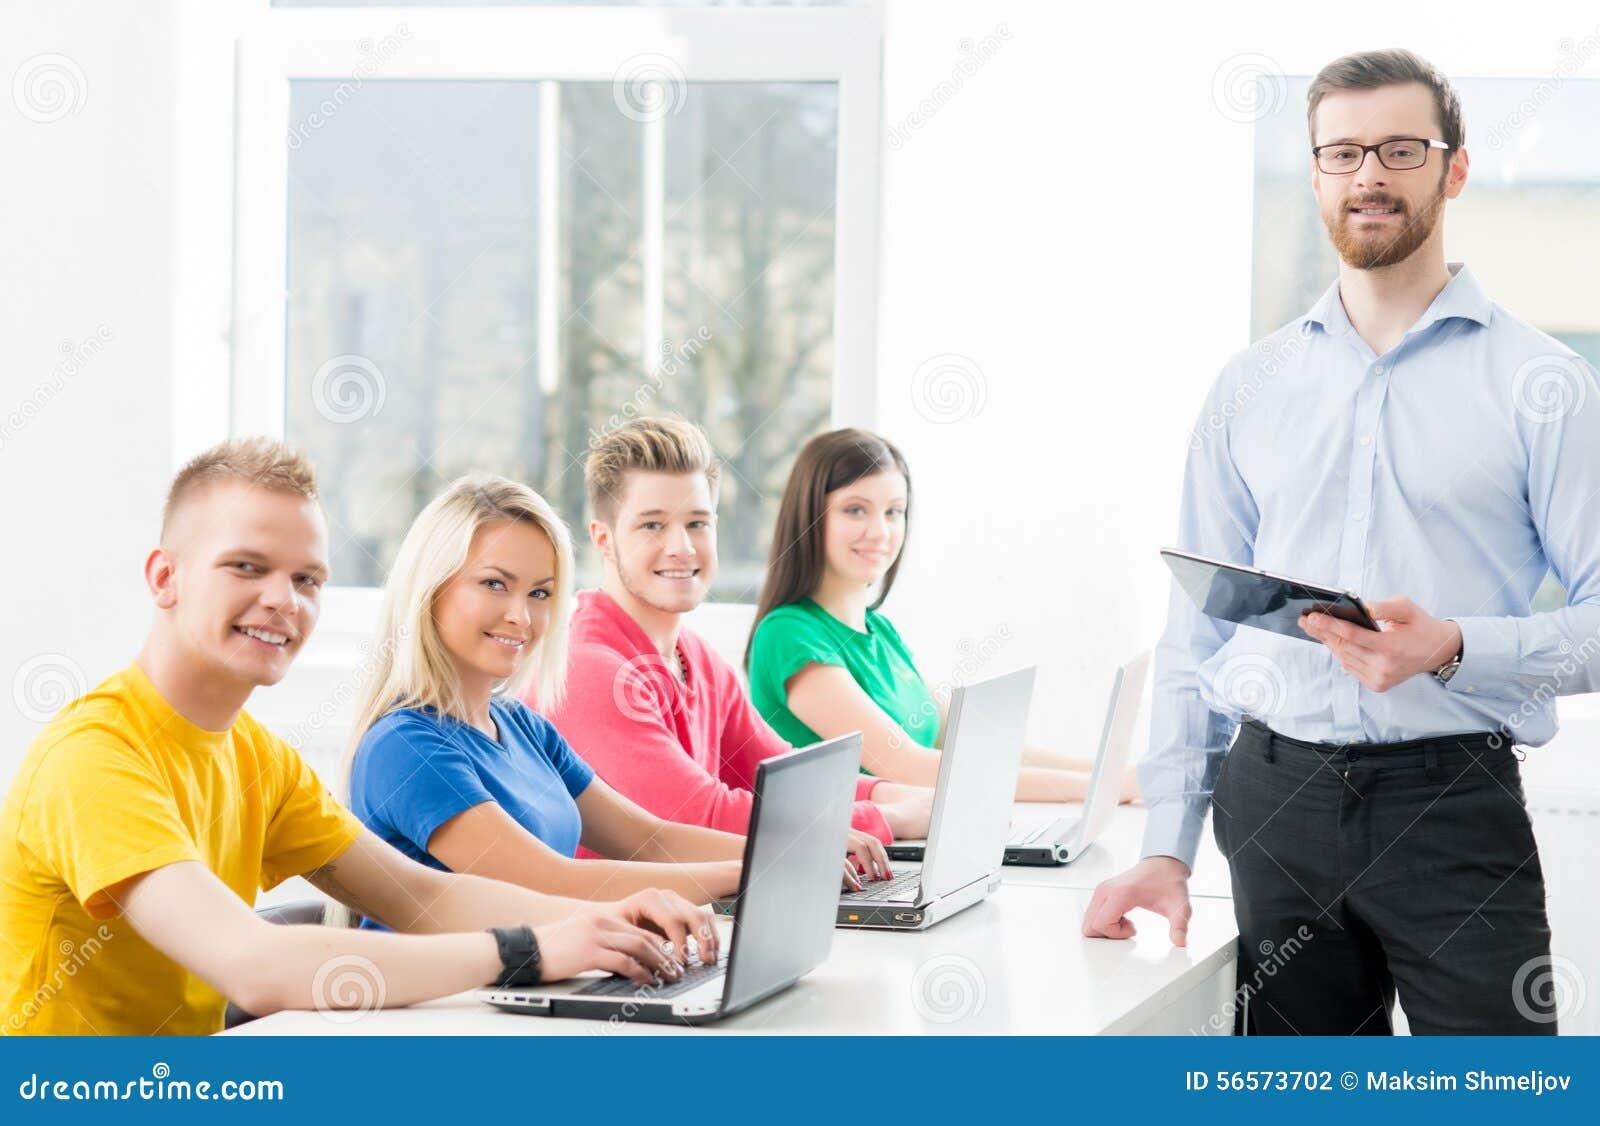 Download Σπουδαστές στο μάθημα πληροφορικής και προγραμματισμού Στοκ Εικόνες - εικόνα από εκπαίδευση, κωδικοποίηση: 56573702